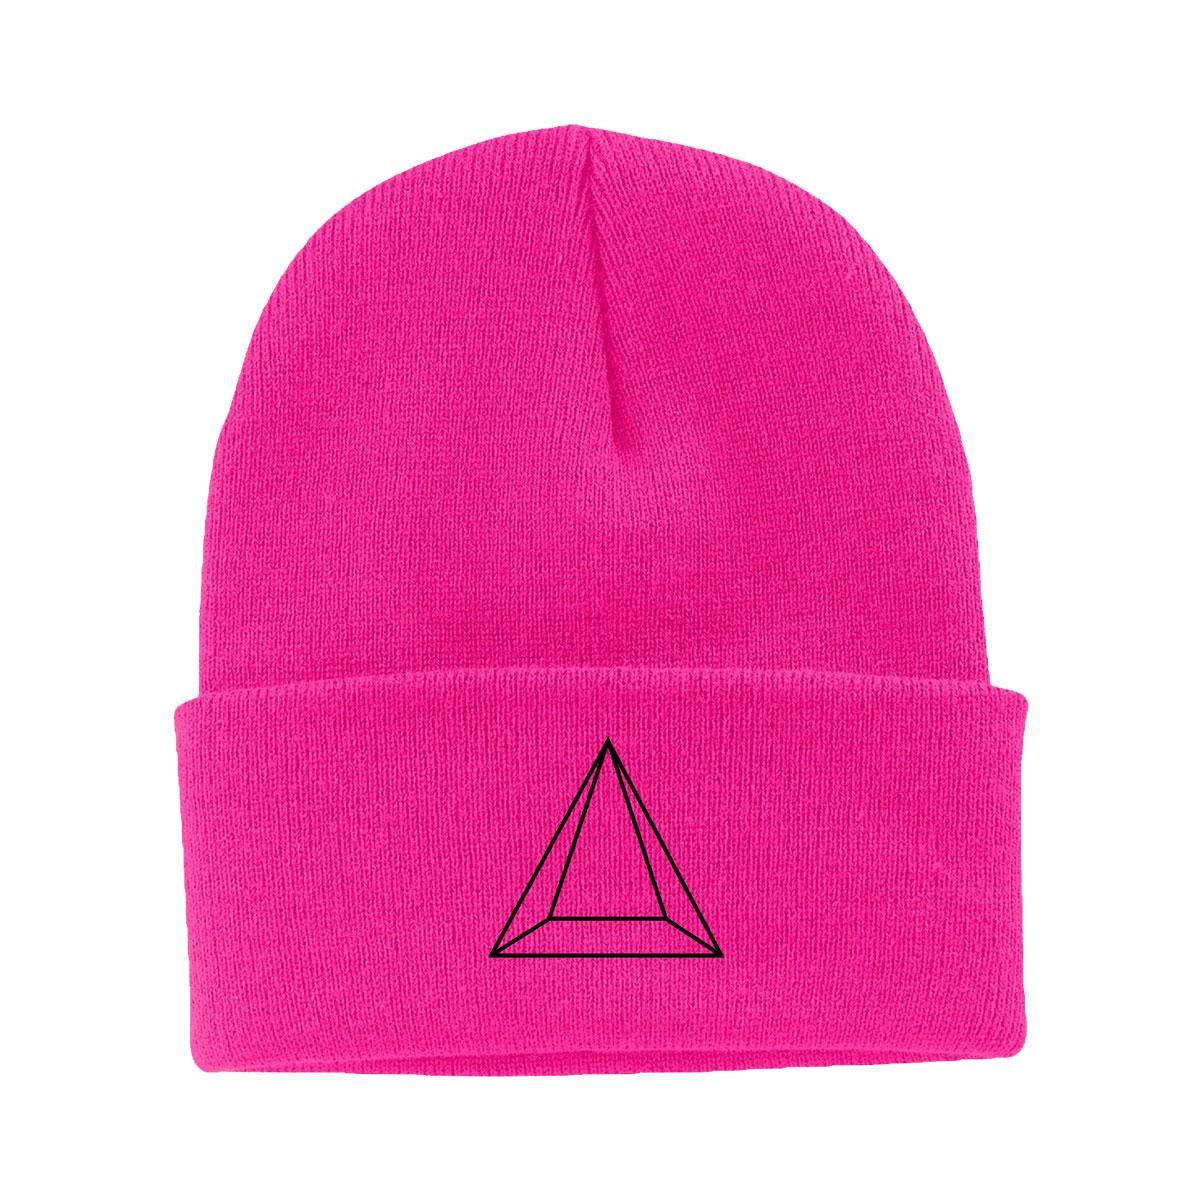 Maluma Pyramid Neon Pink Beanie